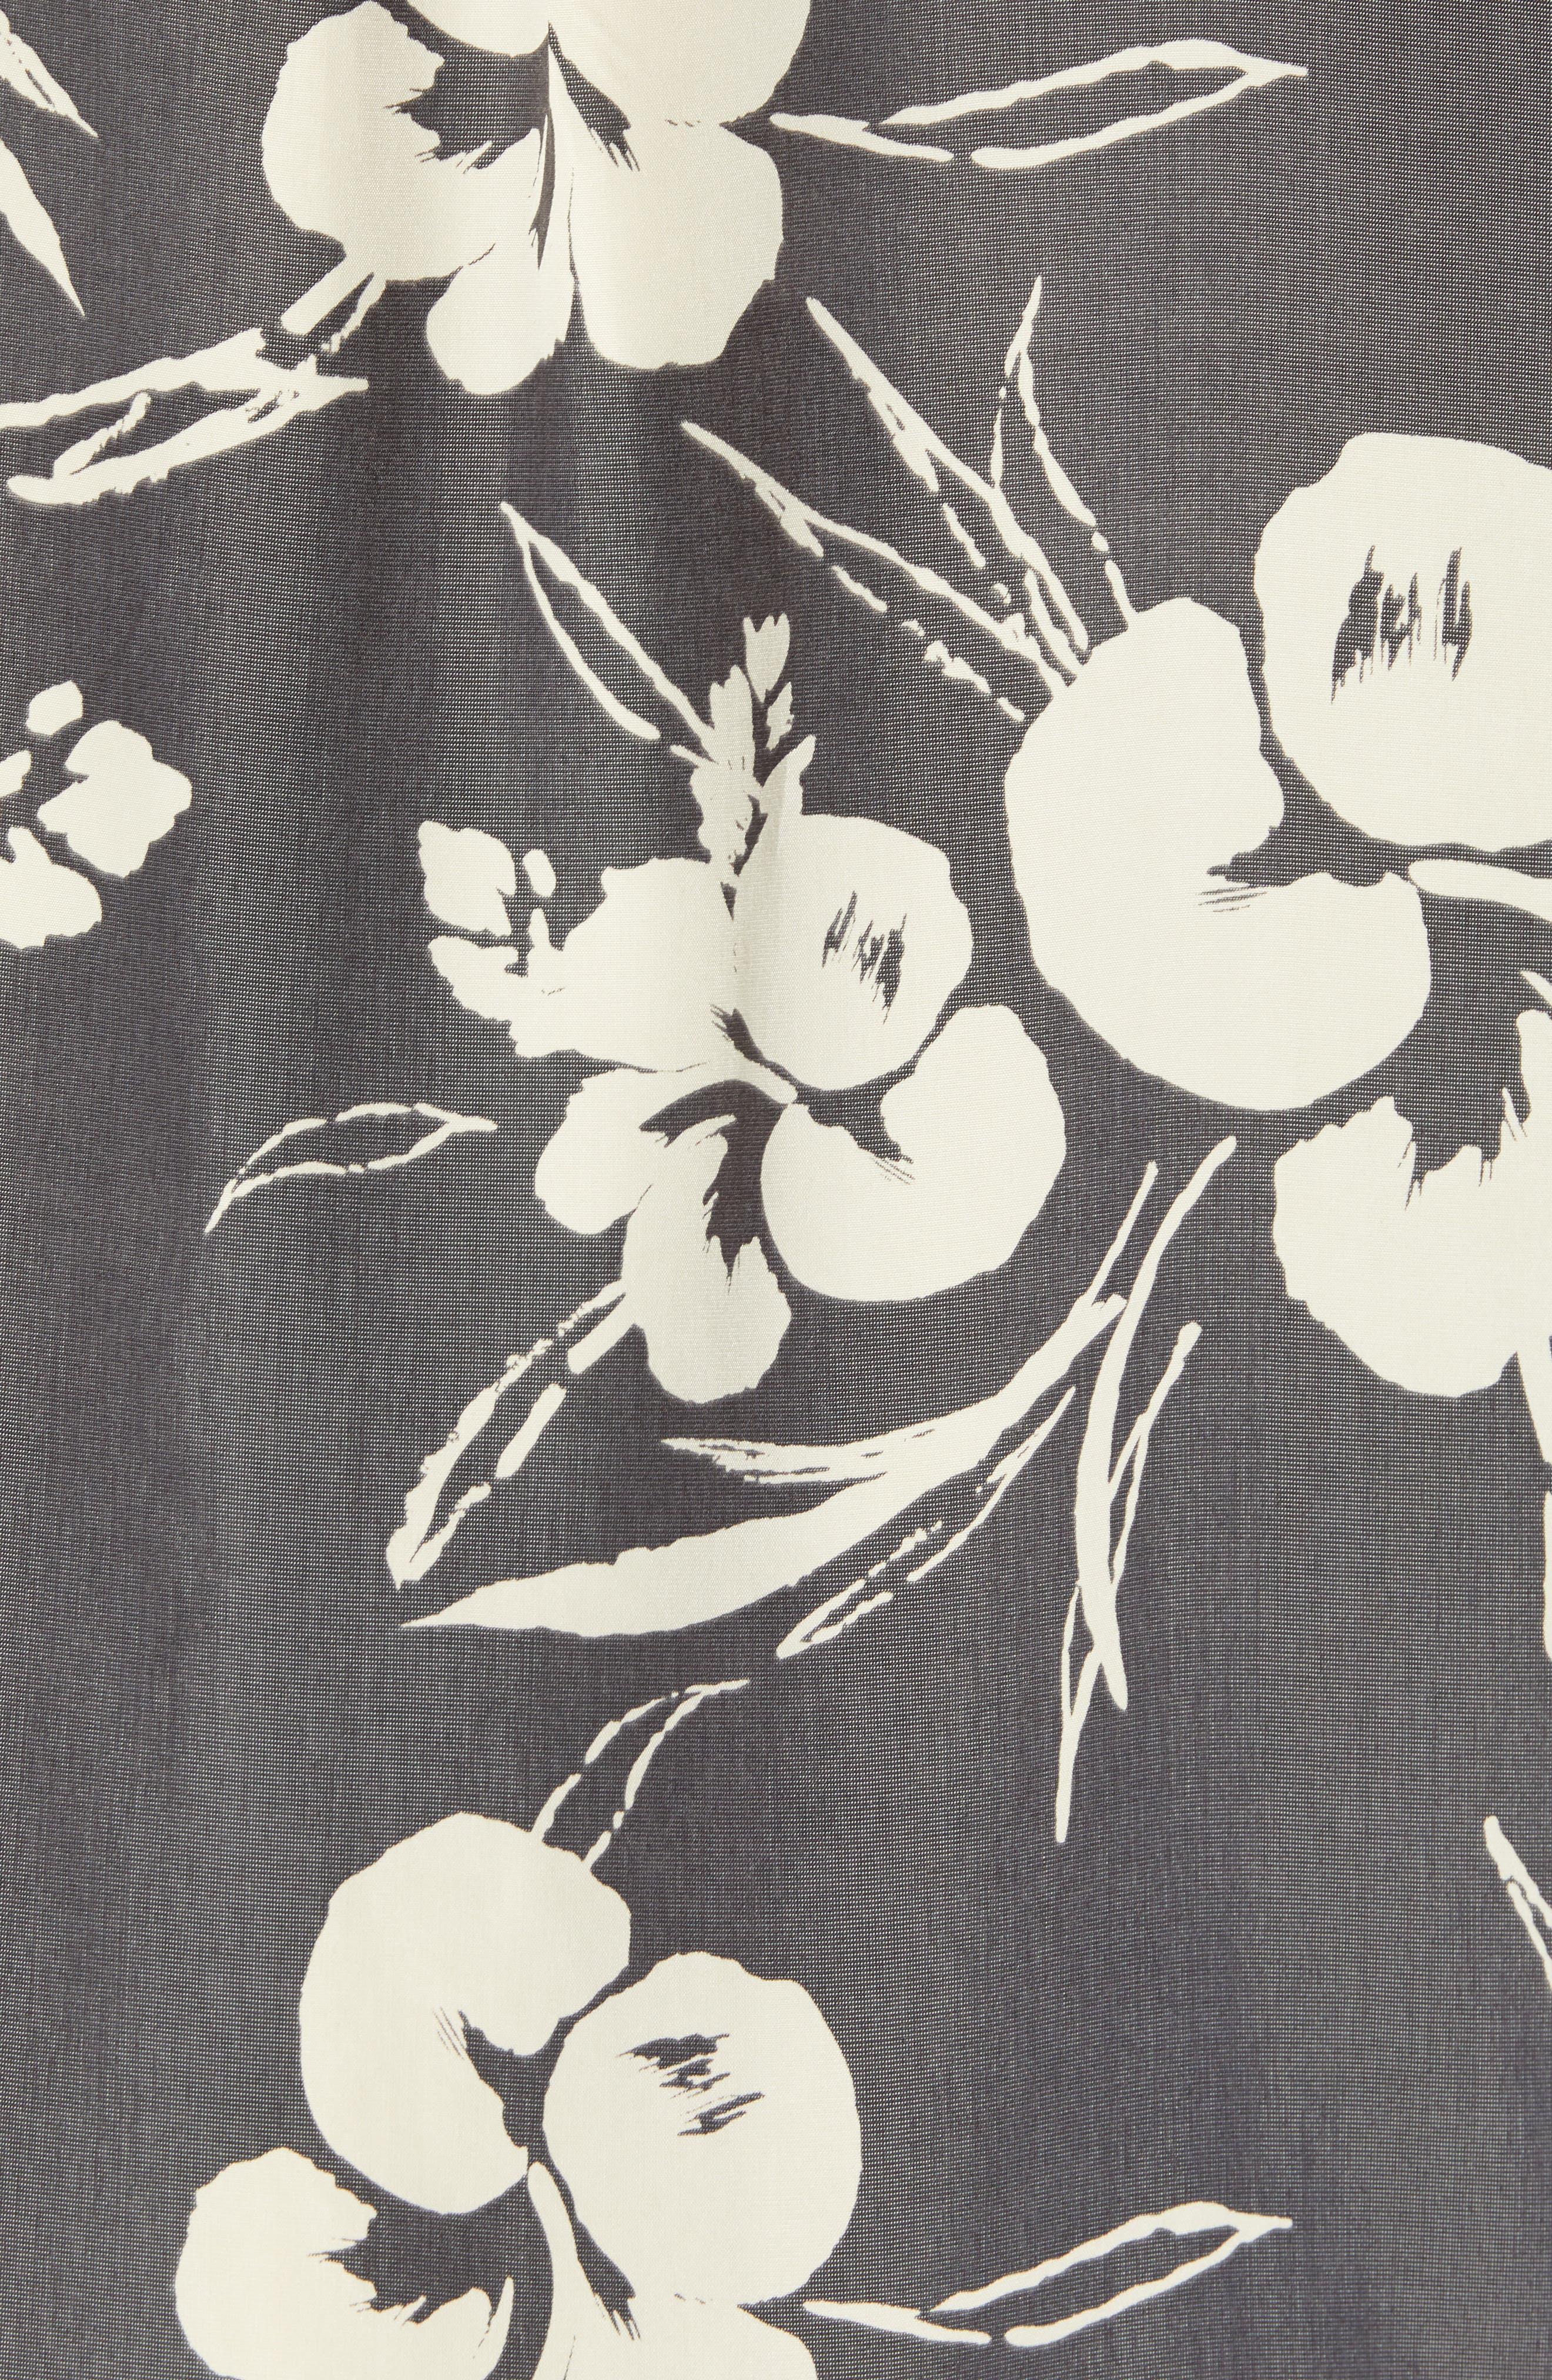 Aloha Print Sport Shirt,                             Alternate thumbnail 5, color,                             Dark Charcoal